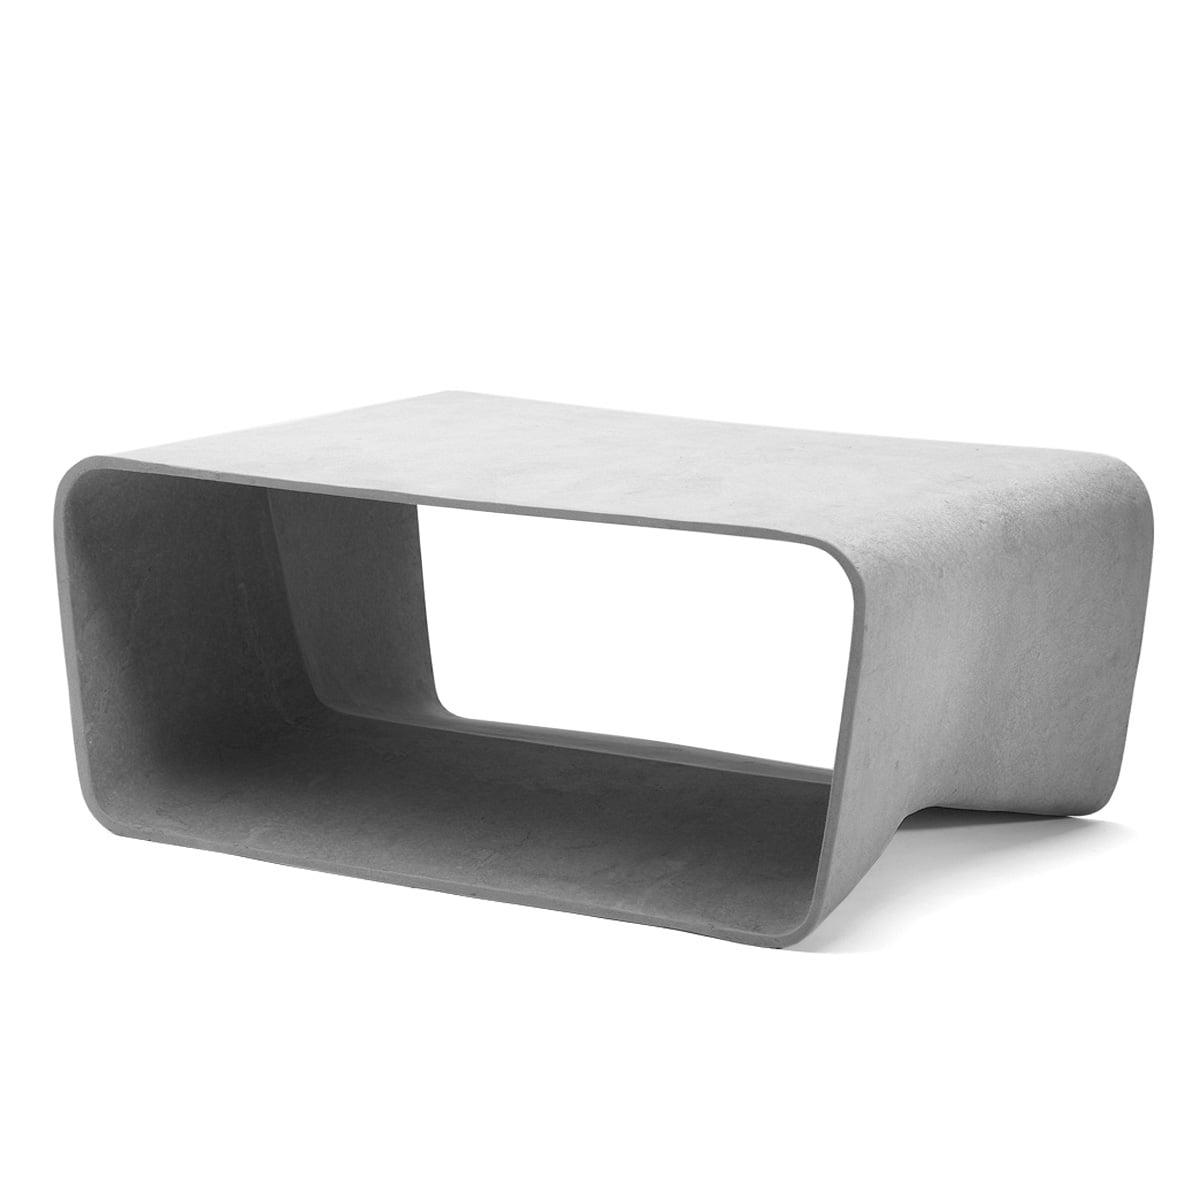 Eternit - Ecal Tisch, grau